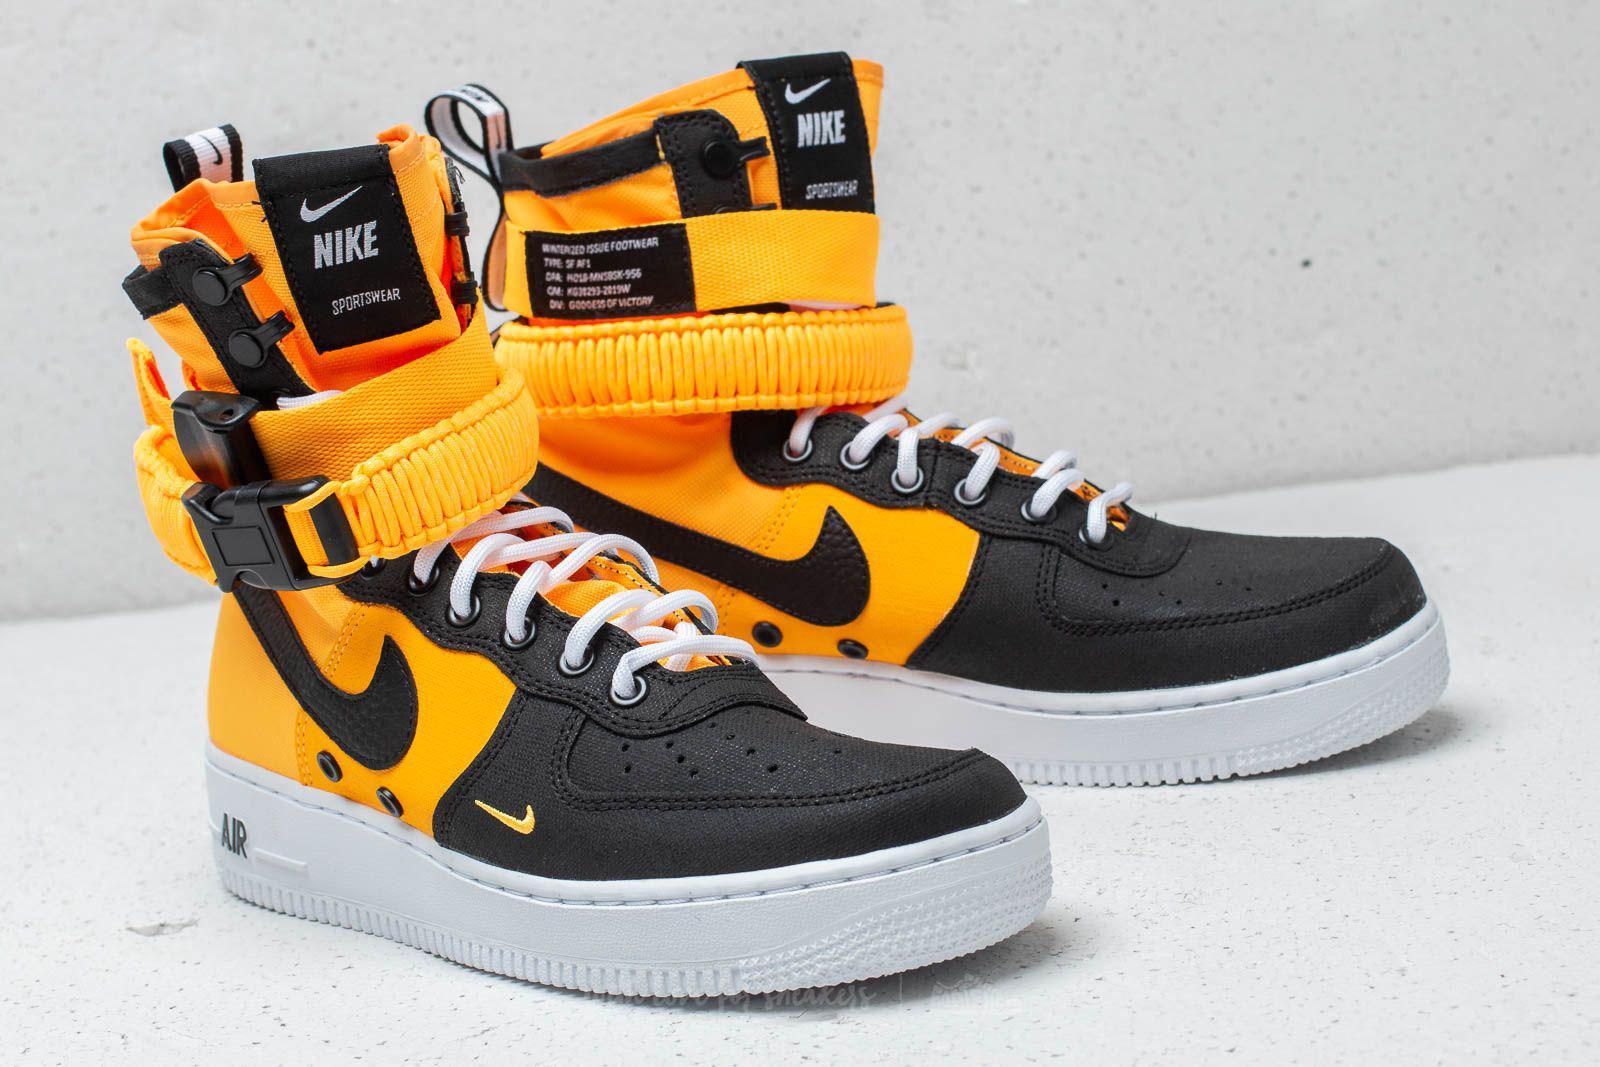 huge discount d53f8 8fae8 Nike Sf Air Force 1 Laser Orange  Black-white for Men - Lyst